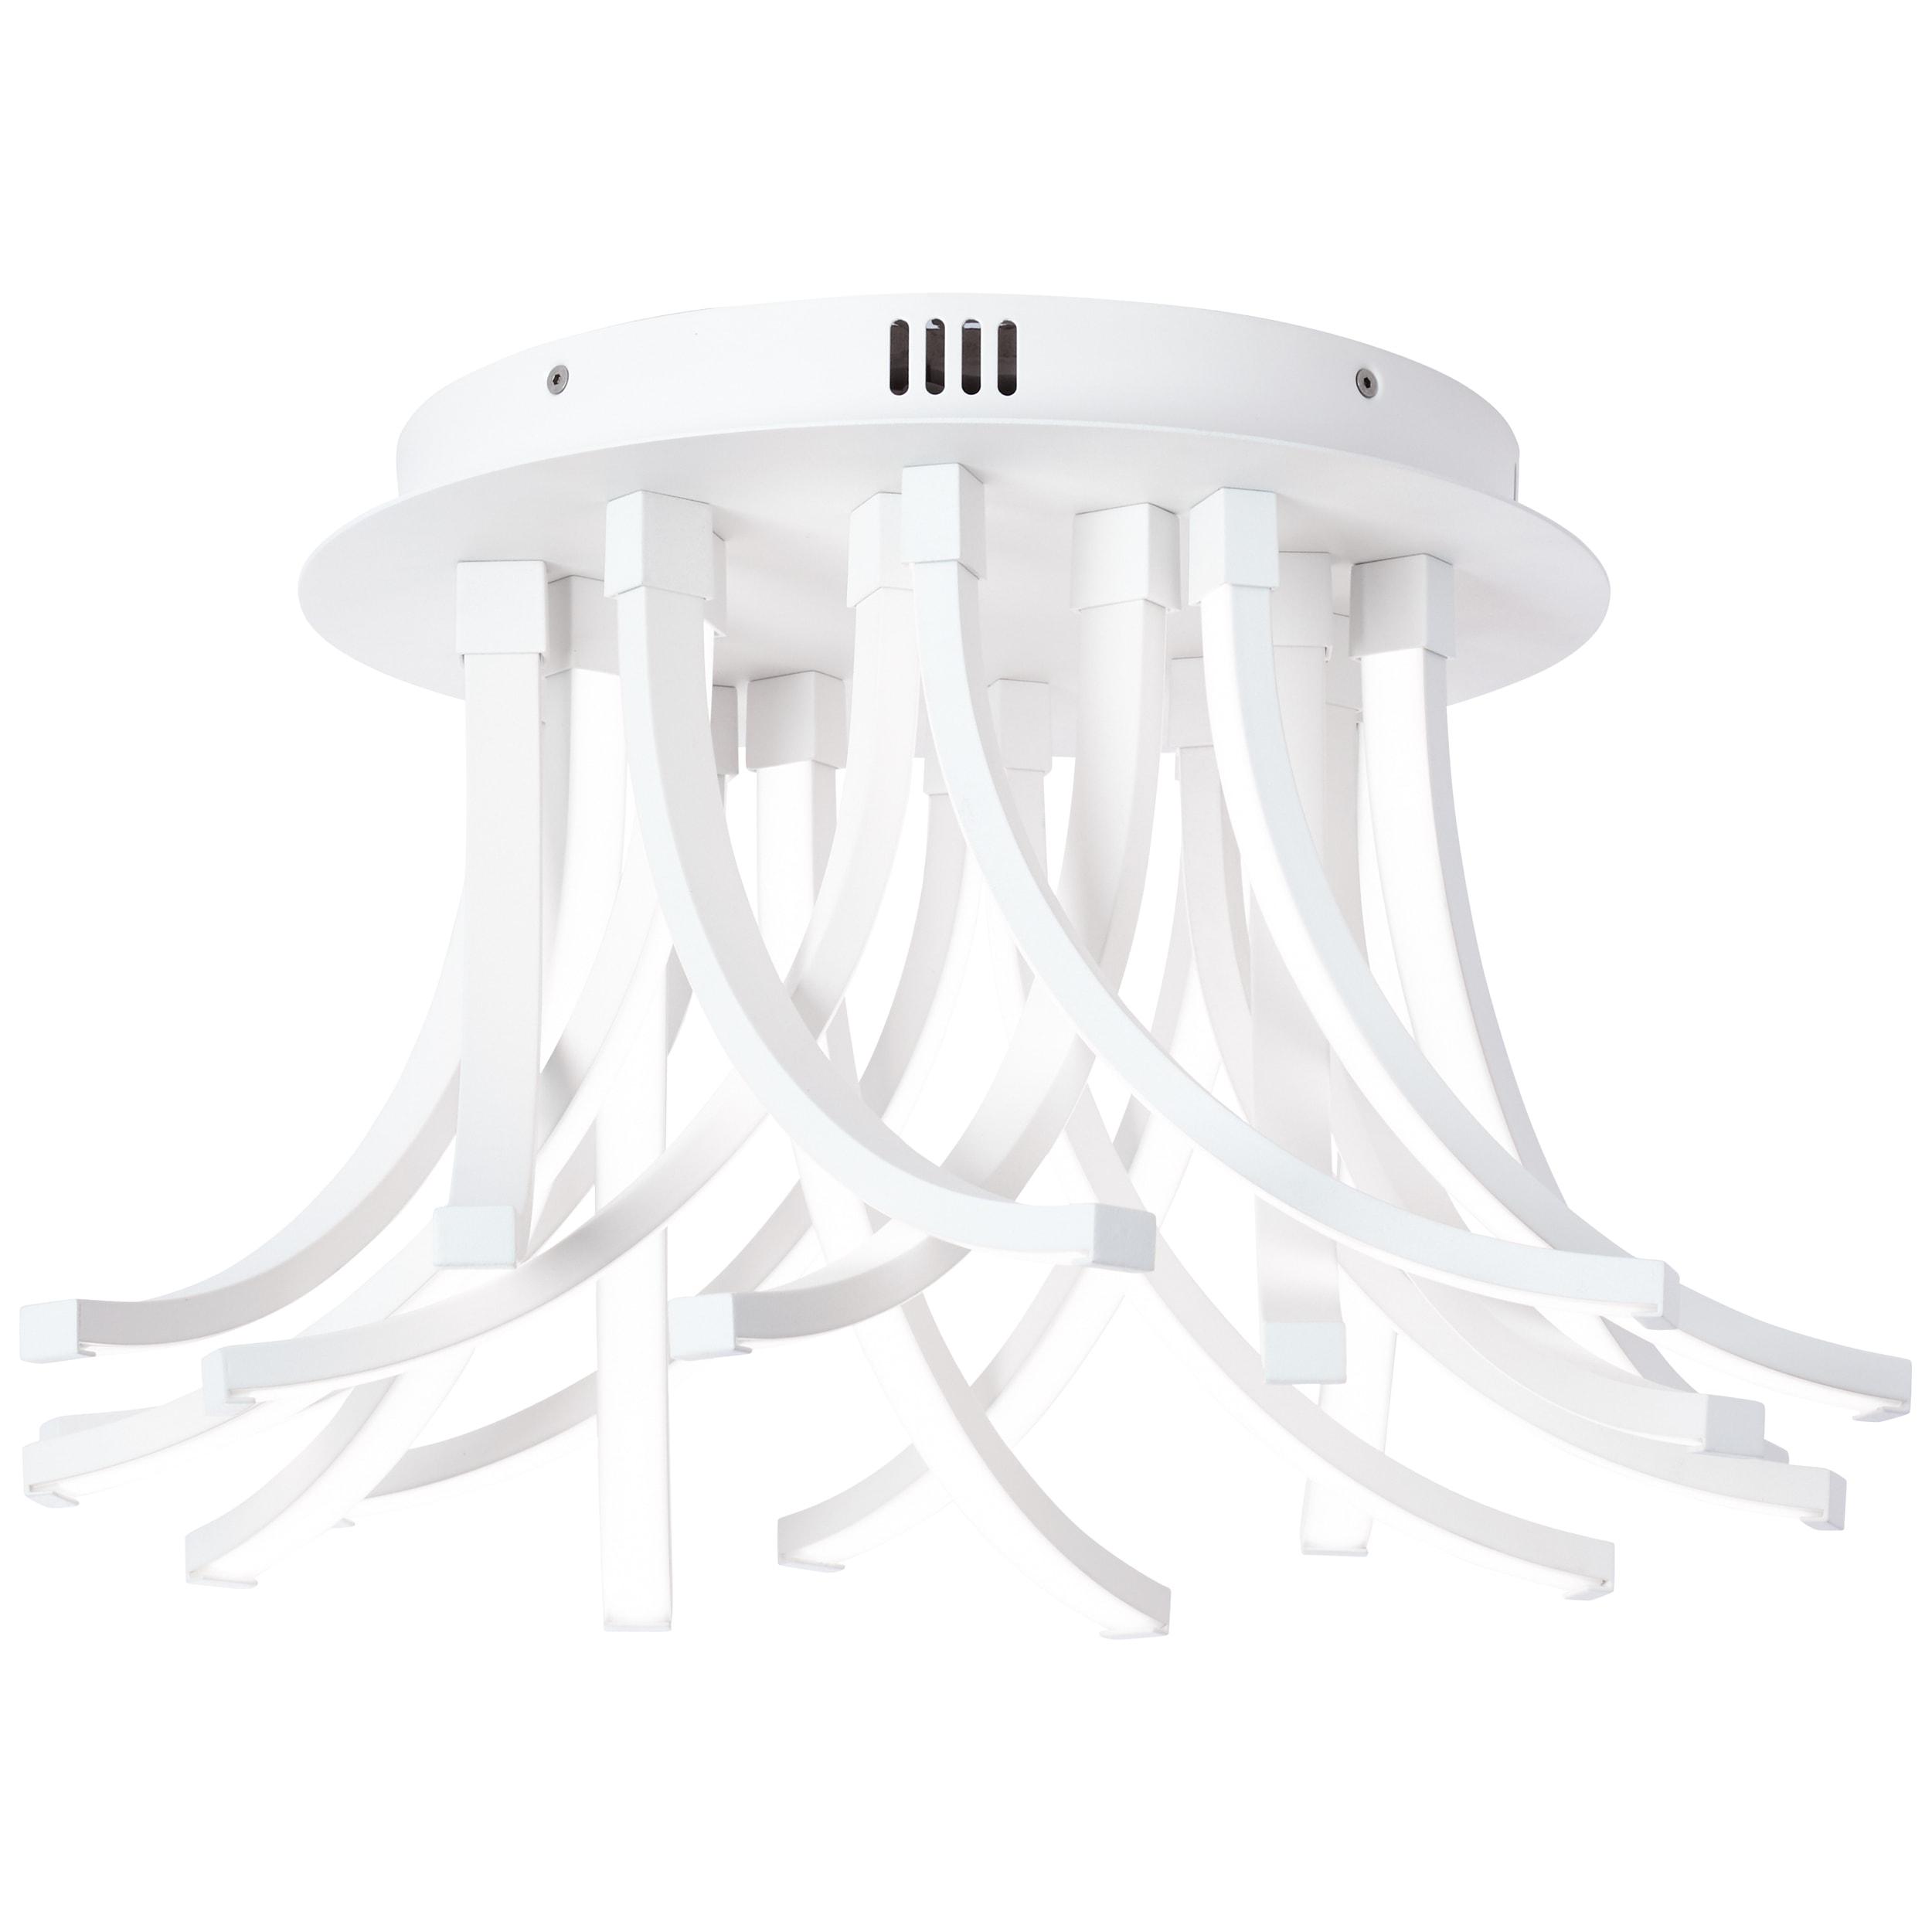 AEG Peria LED Deckenleuchte 49cm sand/weiß